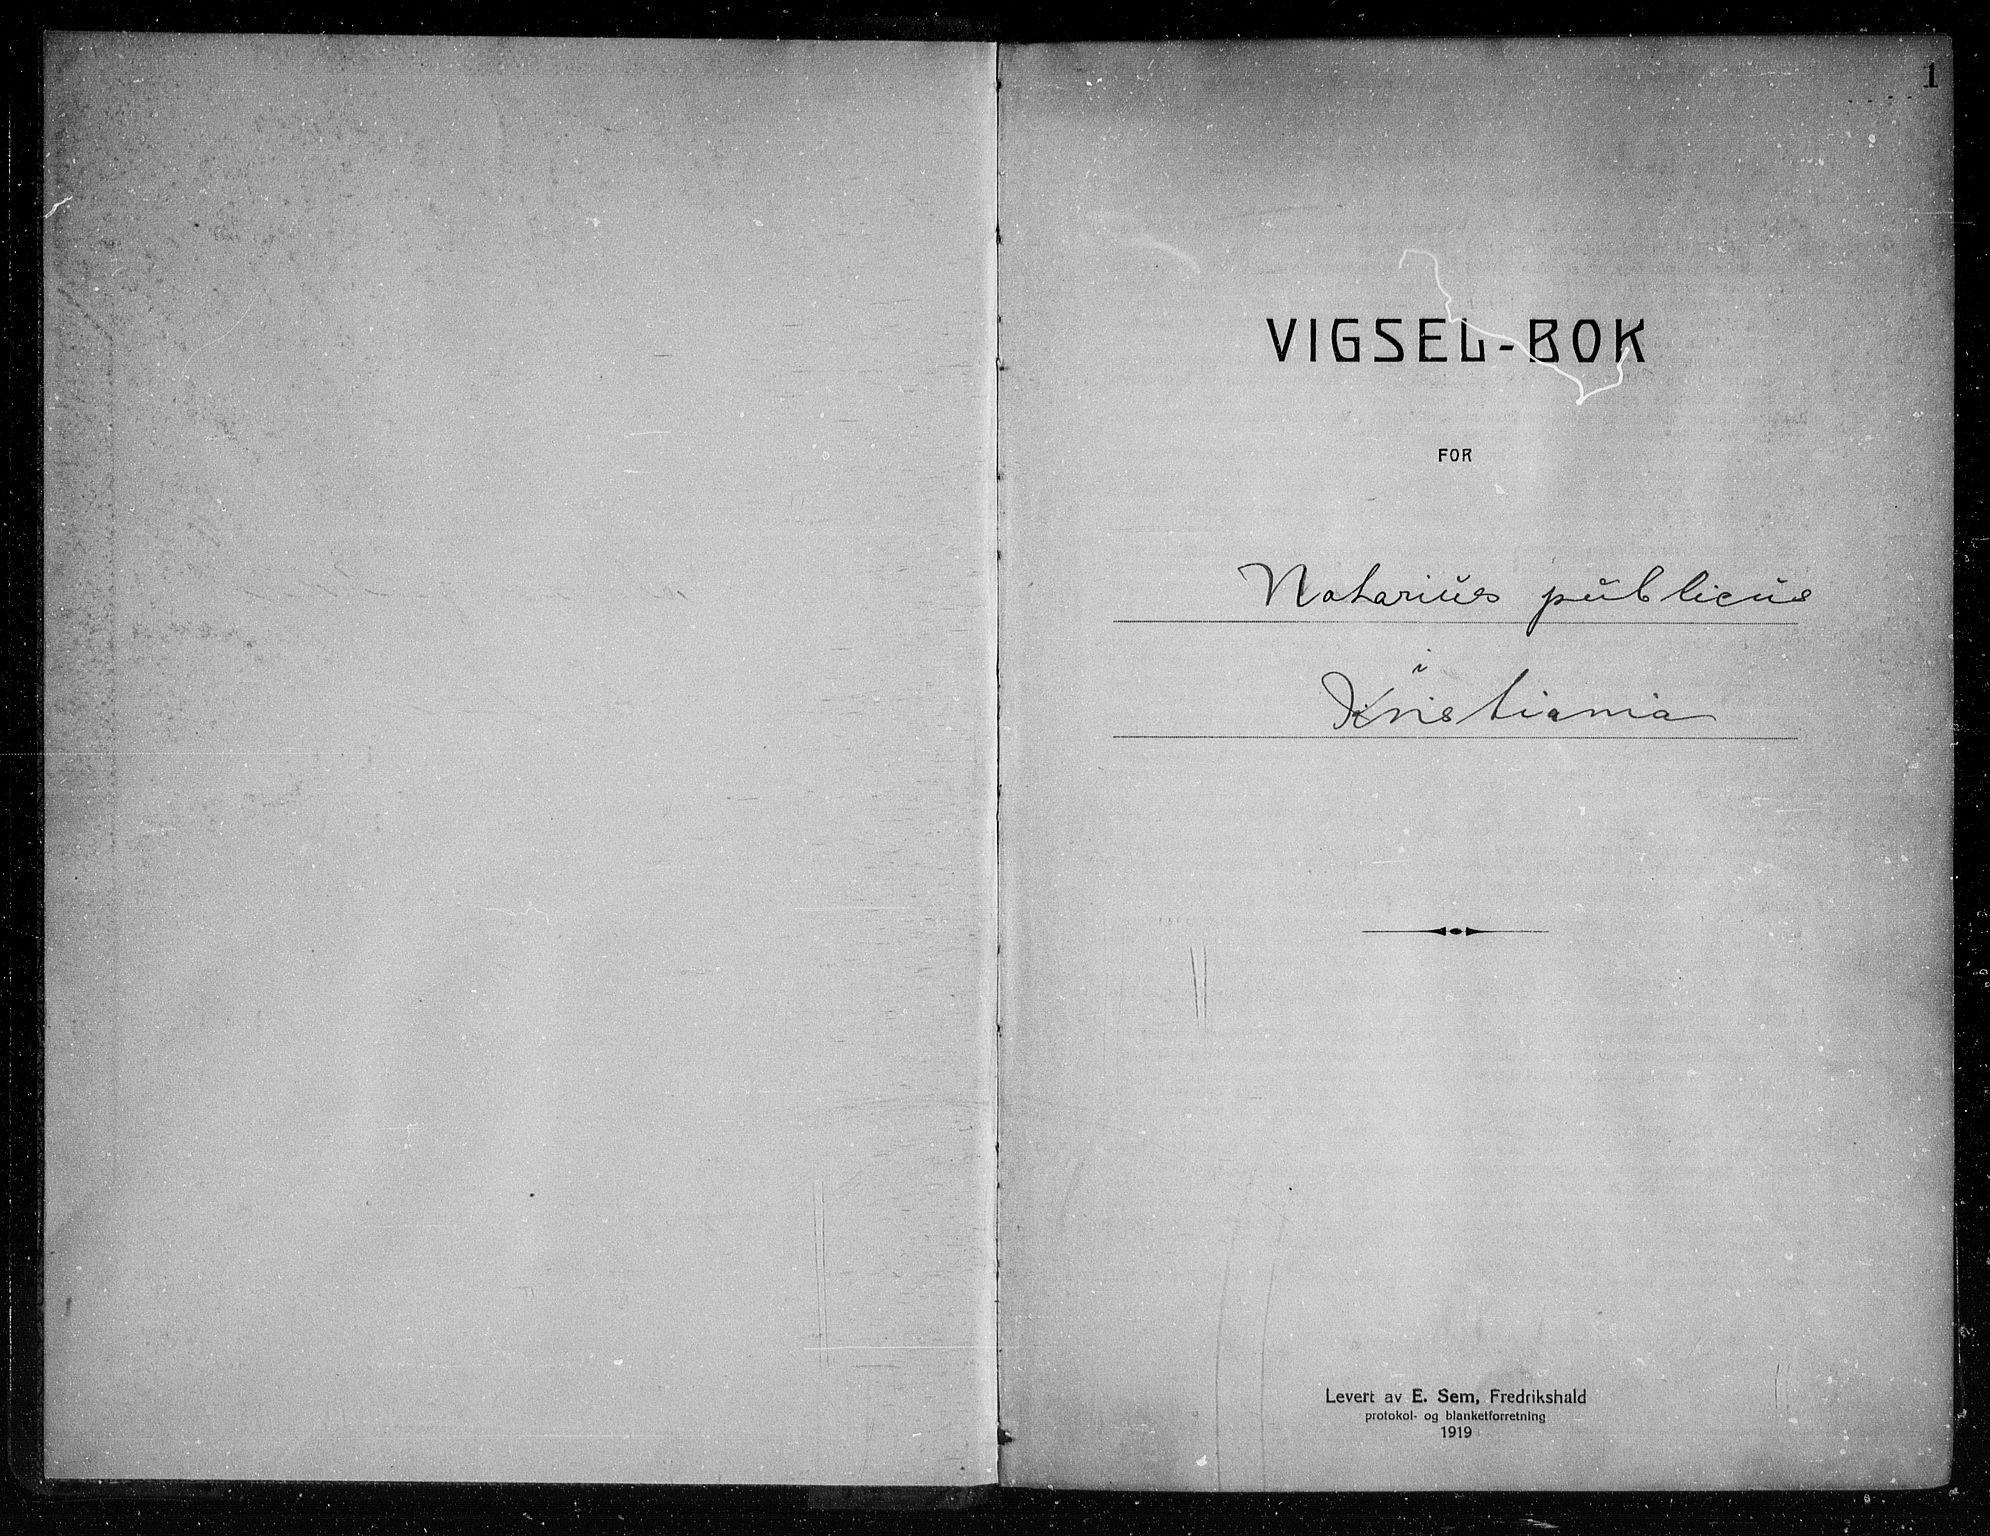 SAO, Oslo byfogd avd. I, L/Lb/Lbb/L0015: Notarialprotokoll, rekke II: Vigsler, 1921-1922, s. 1a